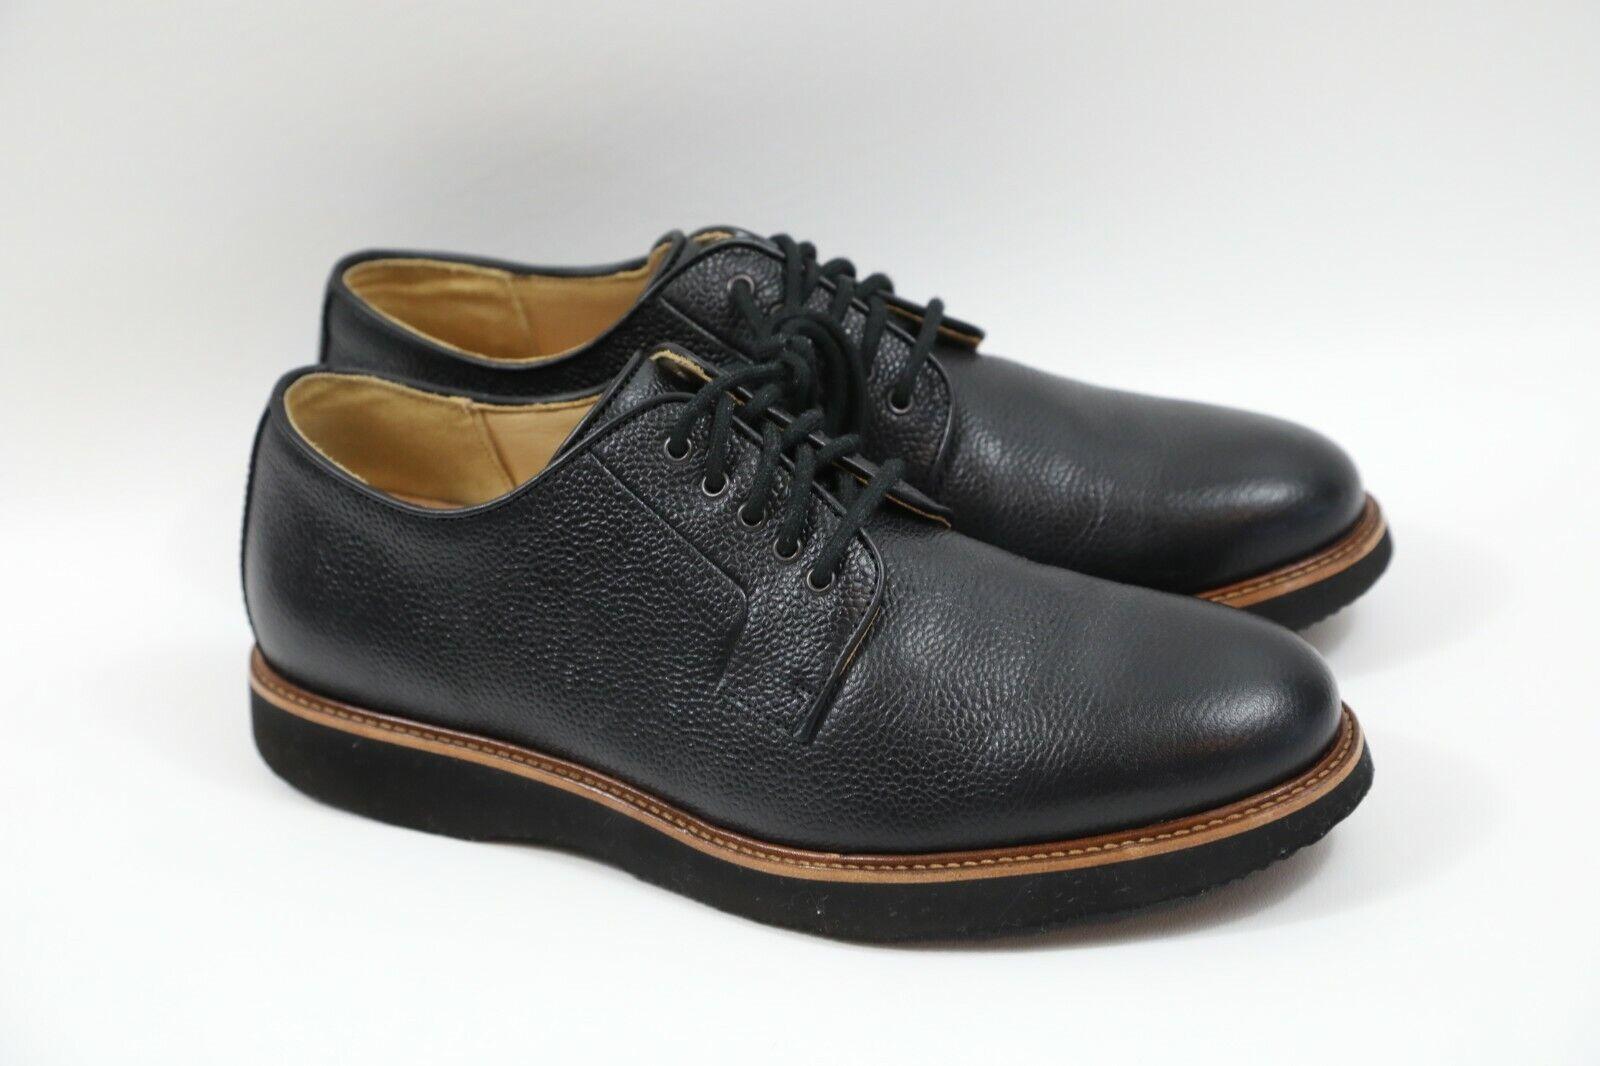 83 Samuel Hubbard Highlander Plain Toe Derby shoes Size 10 M